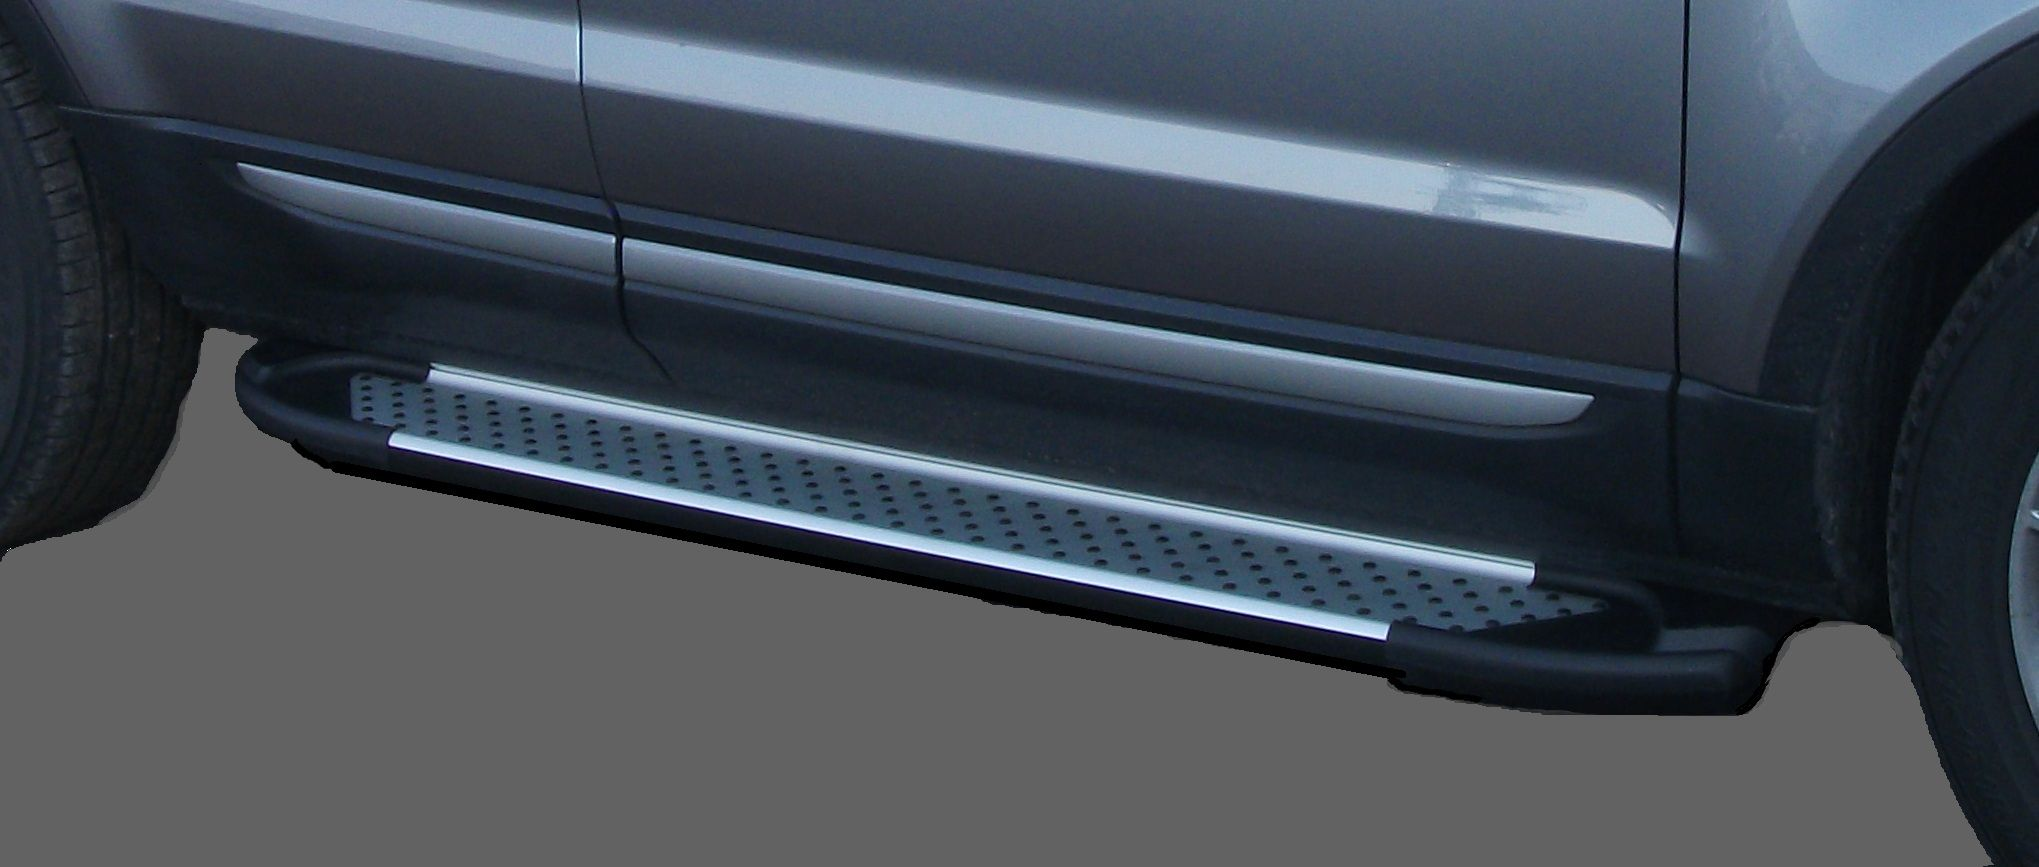 Пороги CAN OTOMOTIV алюминиевые (Sapphire Silver) Mazda (Мазда) CX5 (2012-) от Ravta